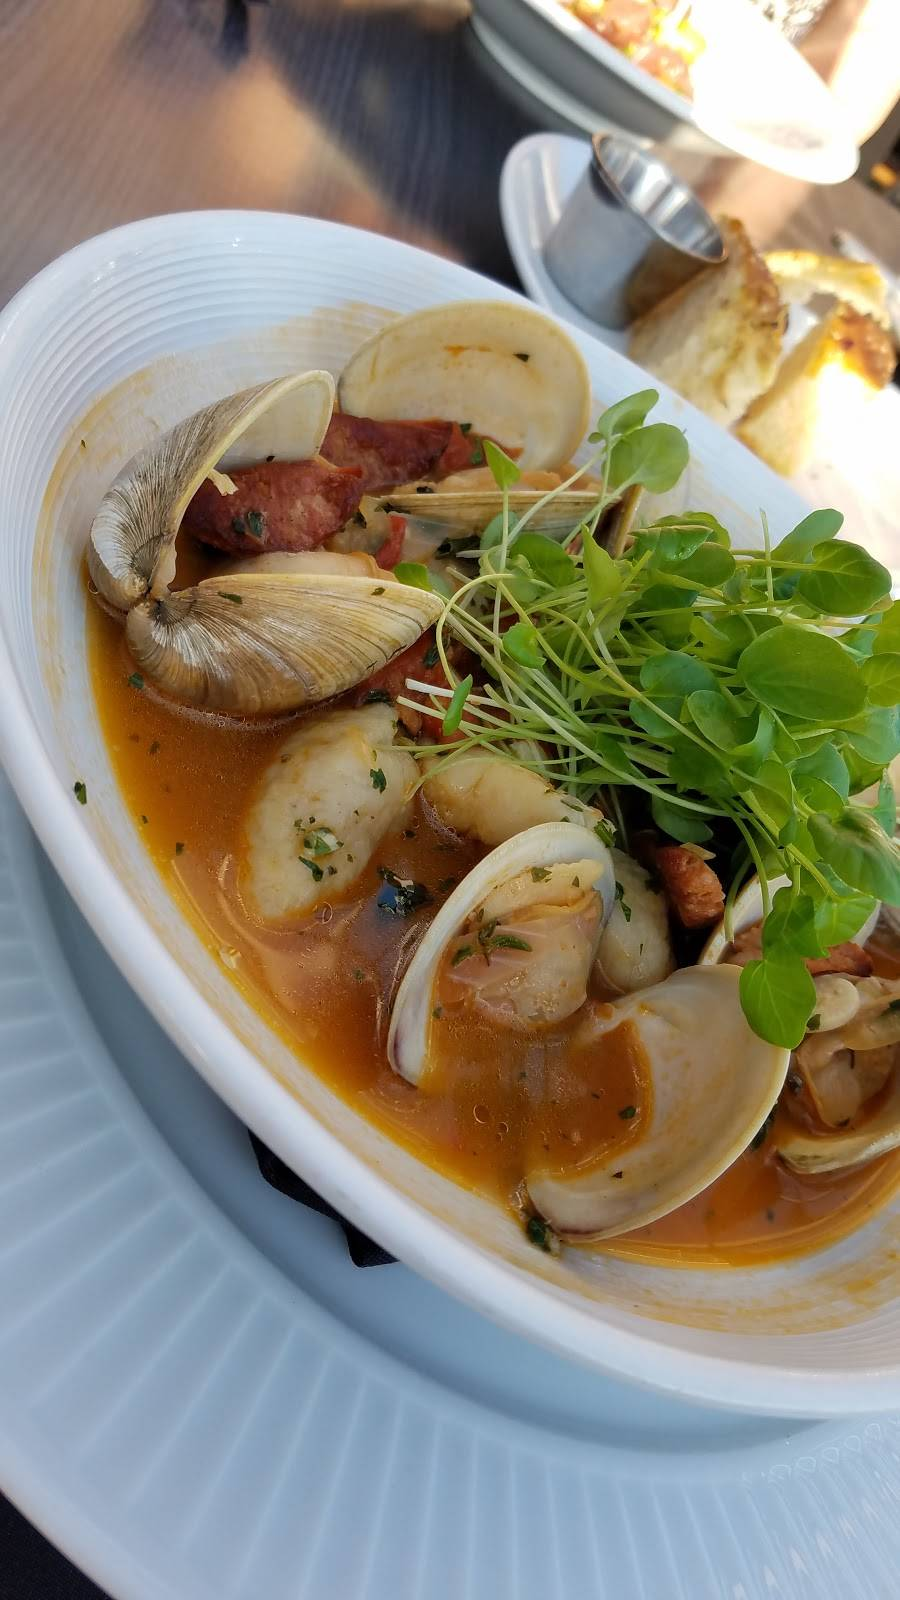 Boulevard Seafood Company | restaurant | 49 W Main St, Somerville, NJ 08876, USA | 9087223300 OR +1 908-722-3300